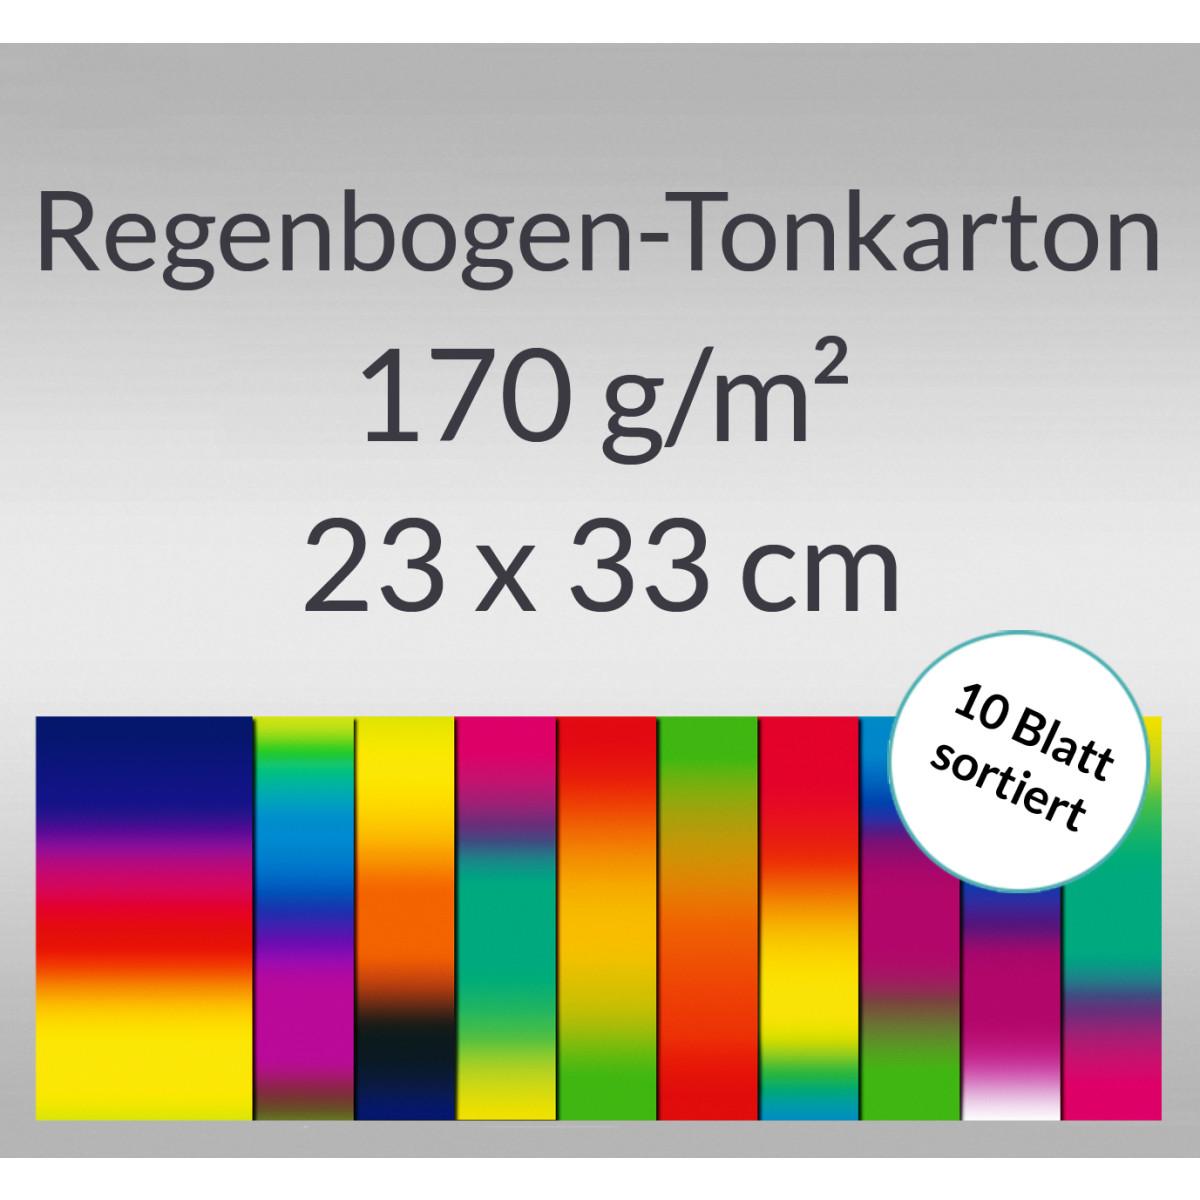 Regenbogen-Tonkarton 170 g/qm 23 x 33 cm - 10 Blatt sortiert